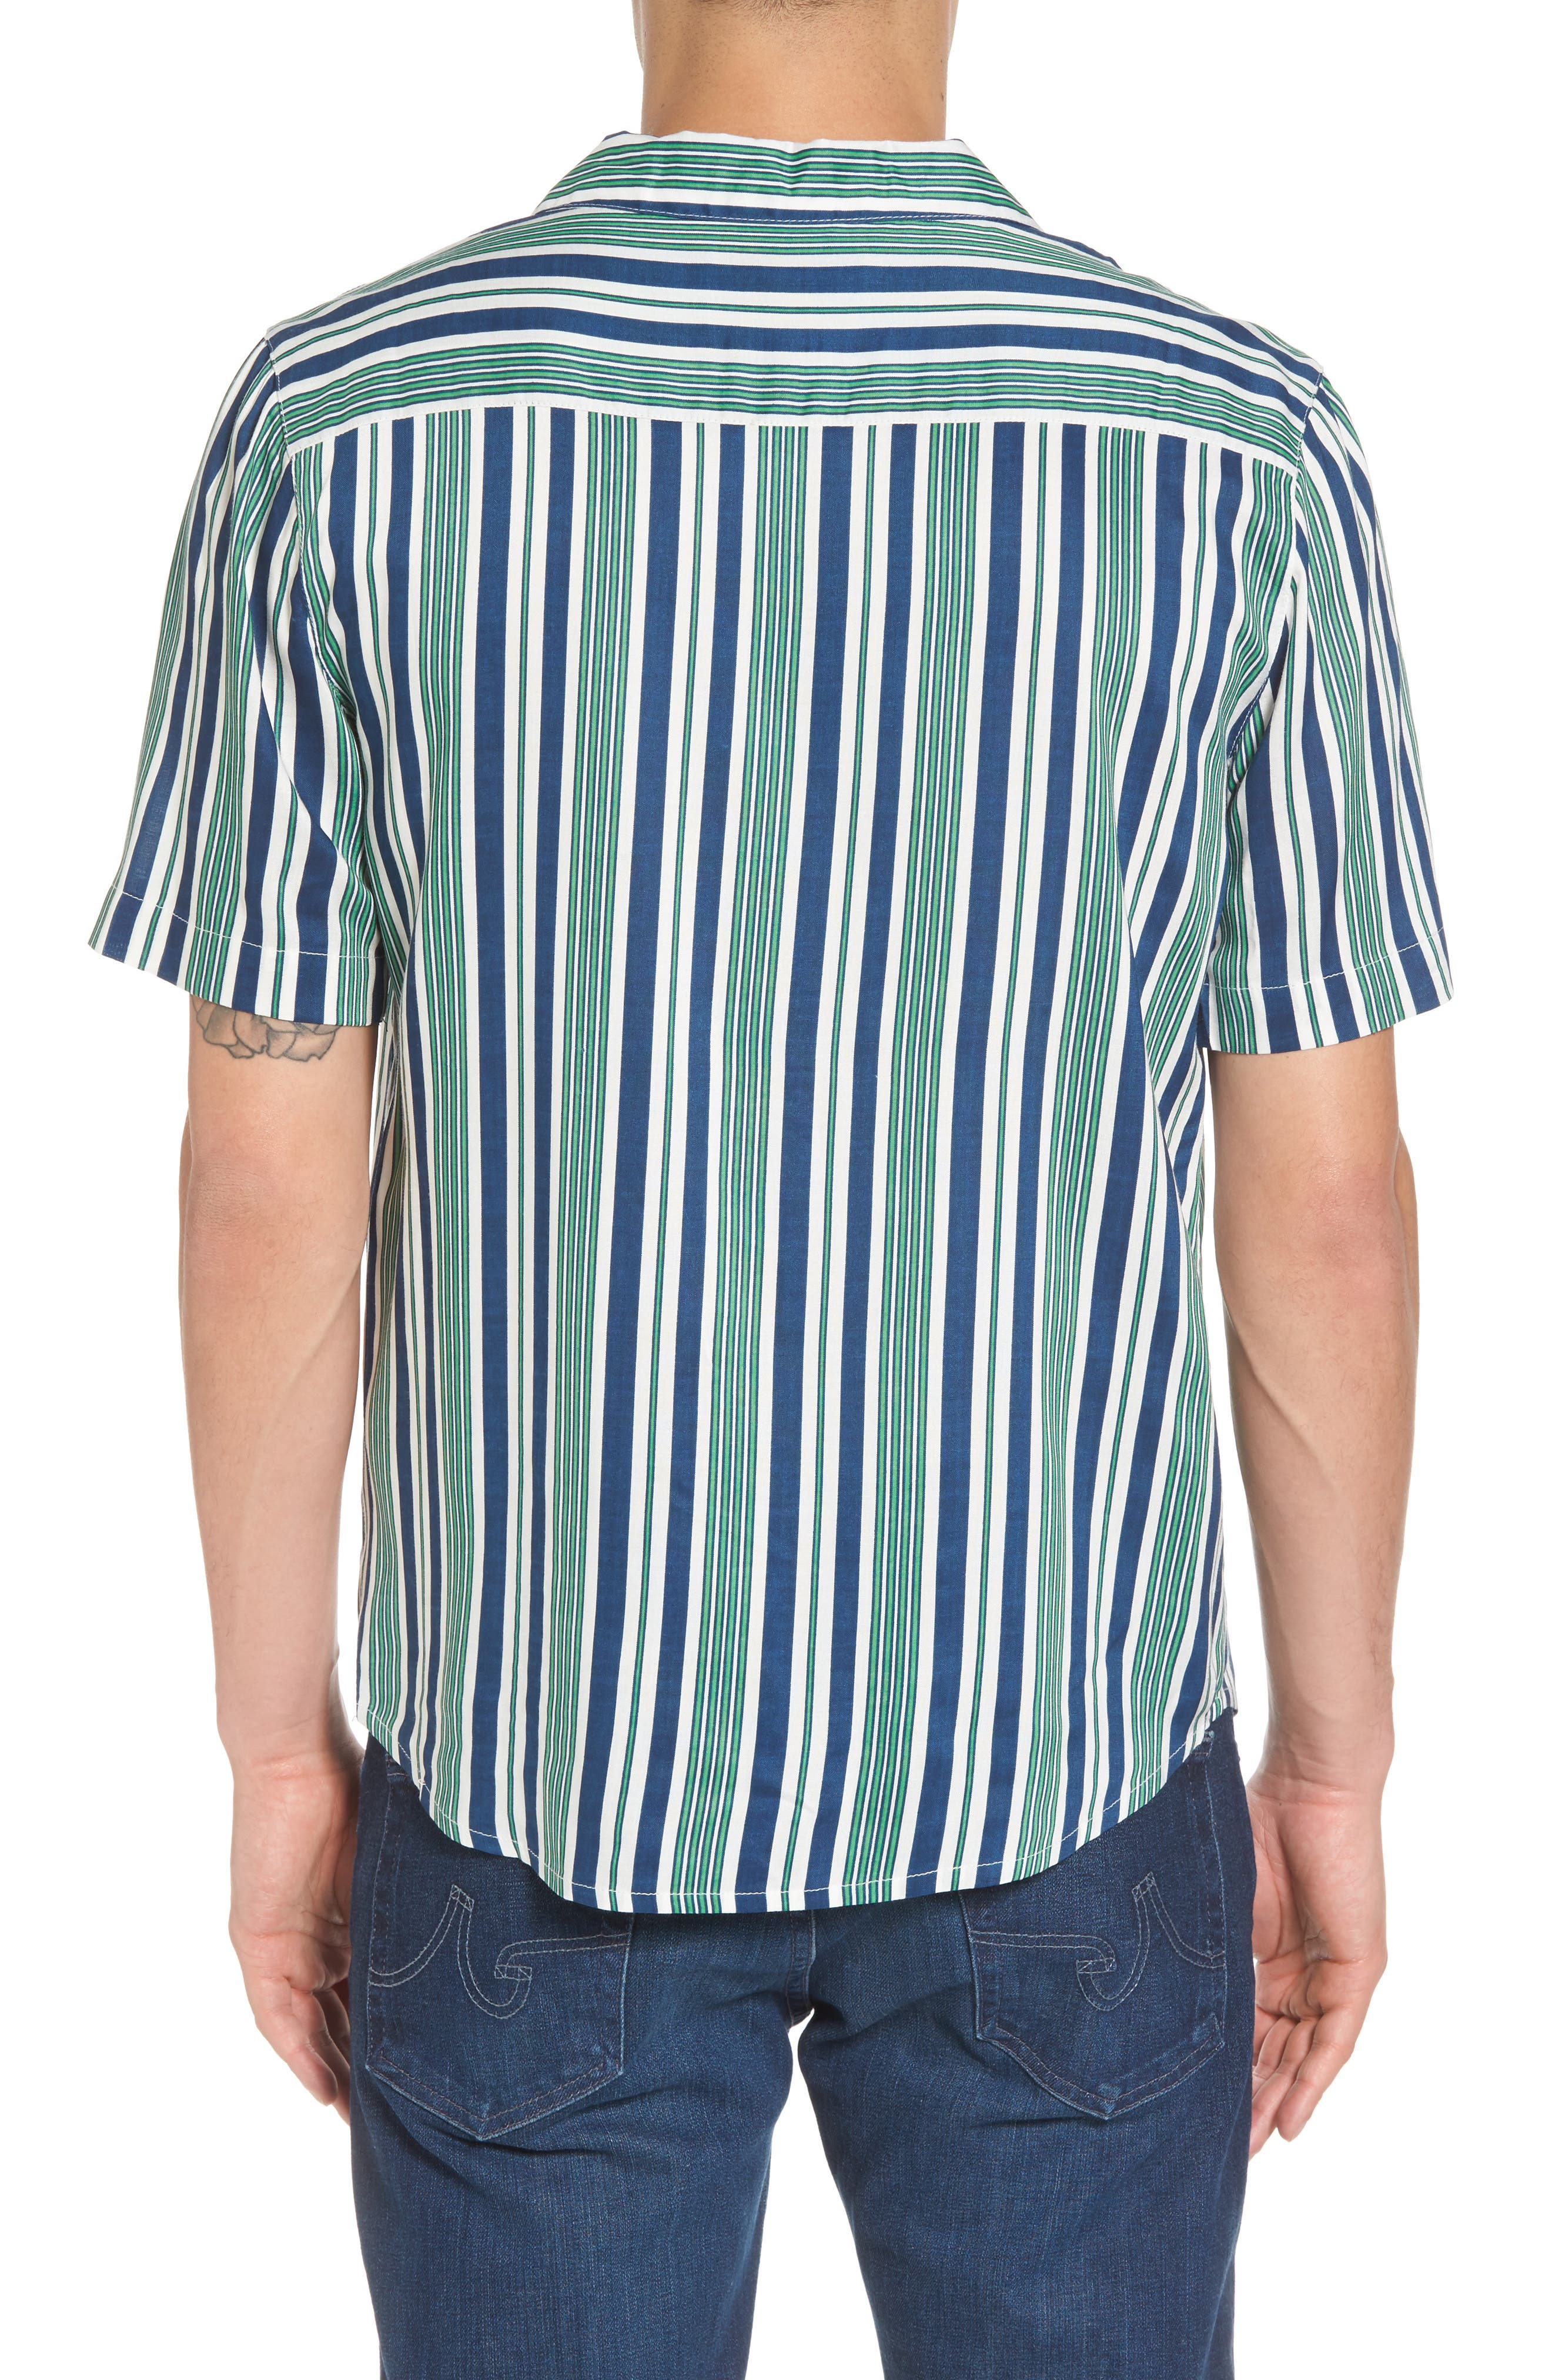 Bay Stripe Woven Shirt,                             Alternate thumbnail 2, color,                             Green